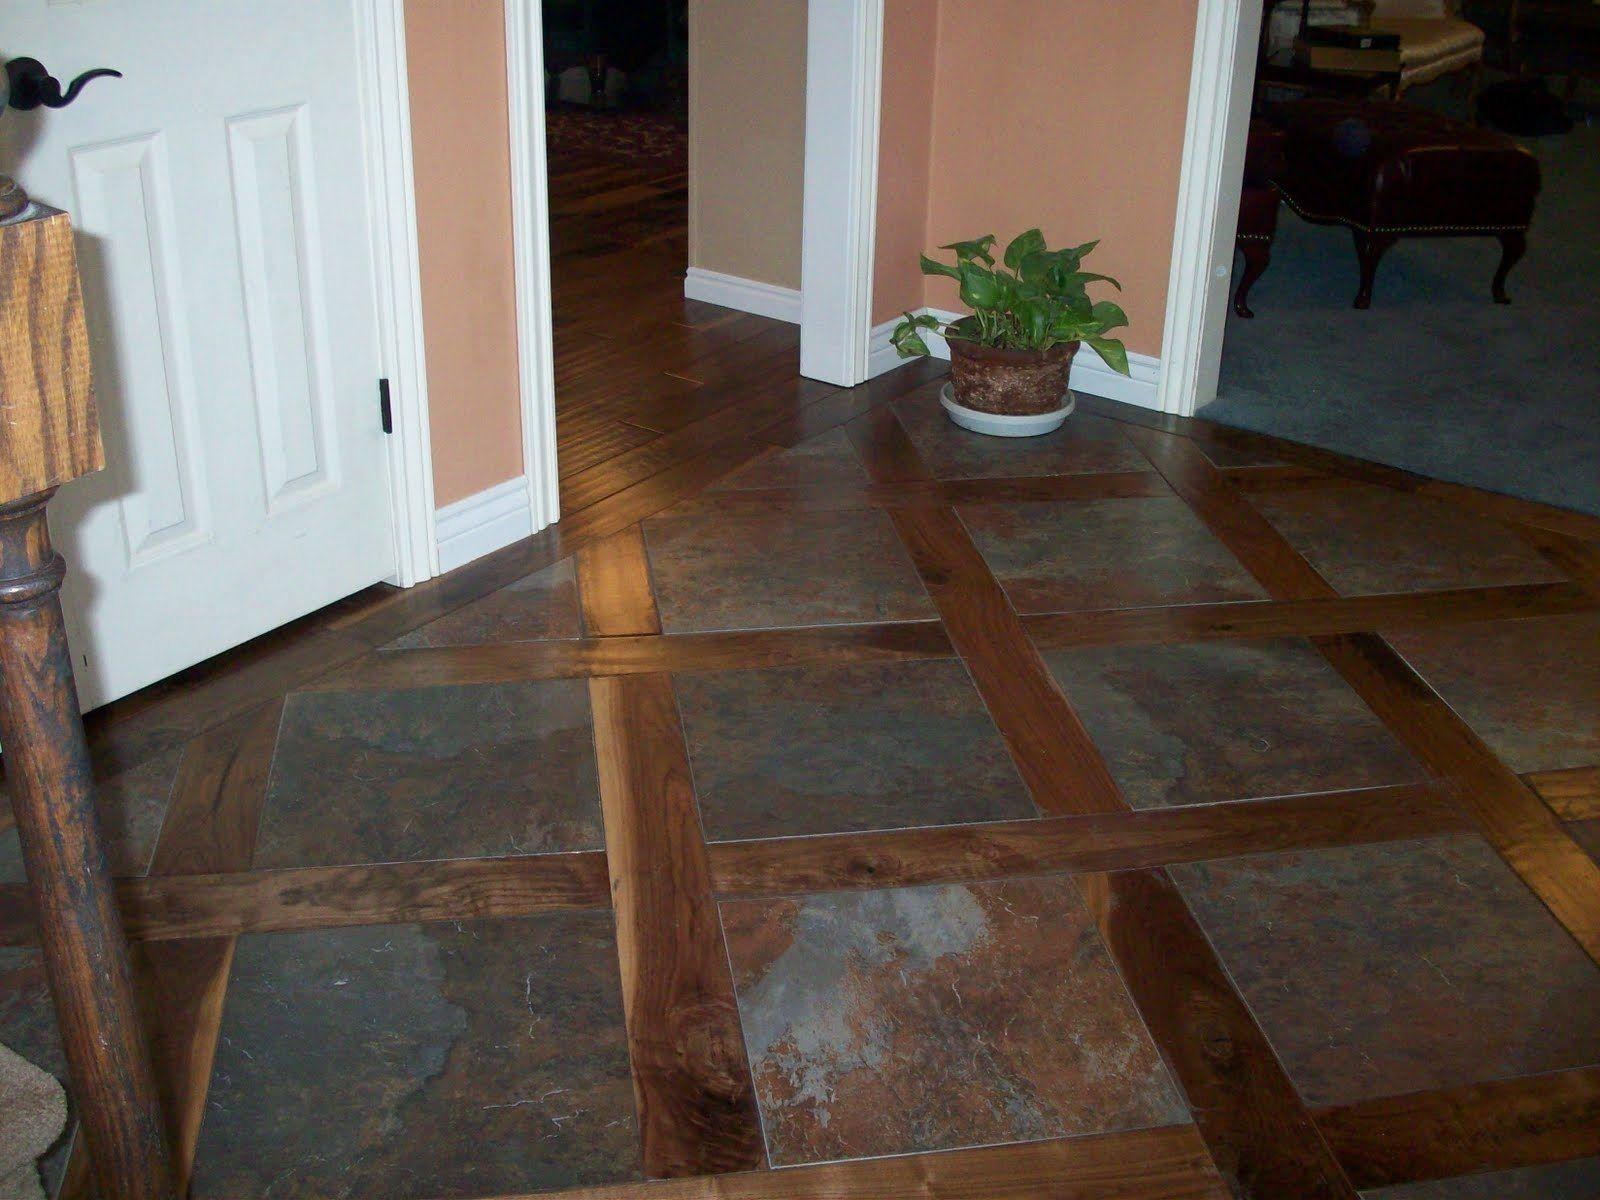 Wood Floors Hallway Transition Direction Laminate Flooring The Laminate Tile Flooring Tile To Wood Transition Flooring